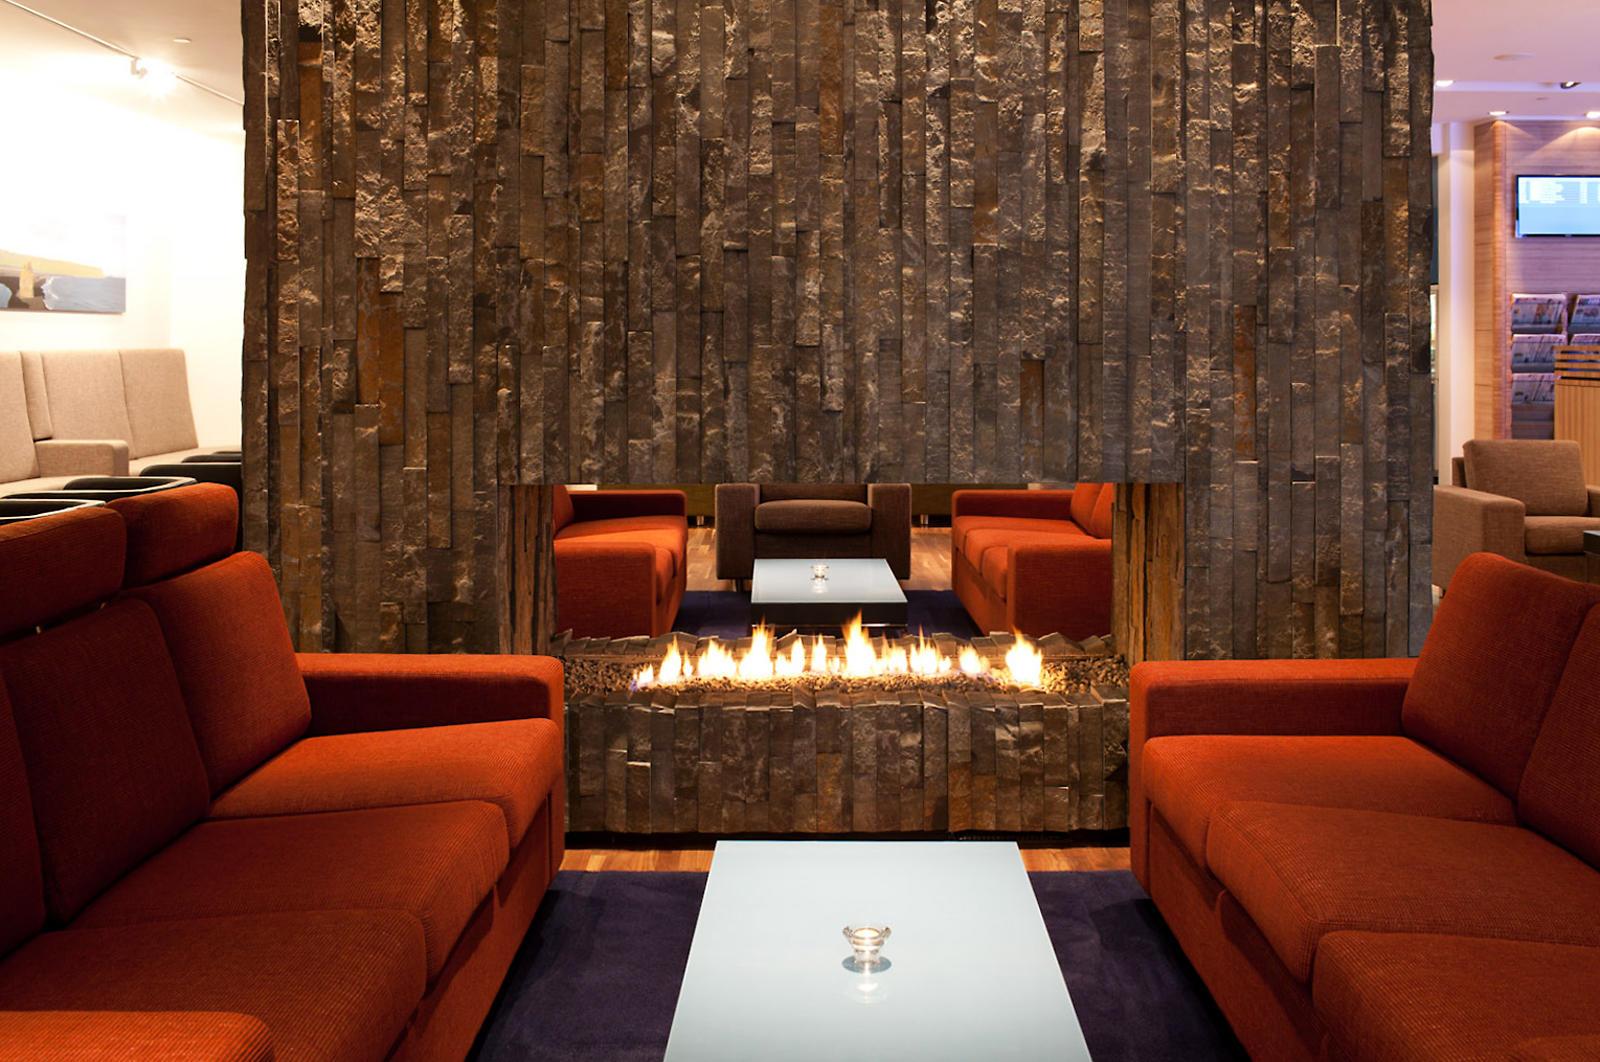 The Icelandair Saga Lounge: An Inside Look-post-image